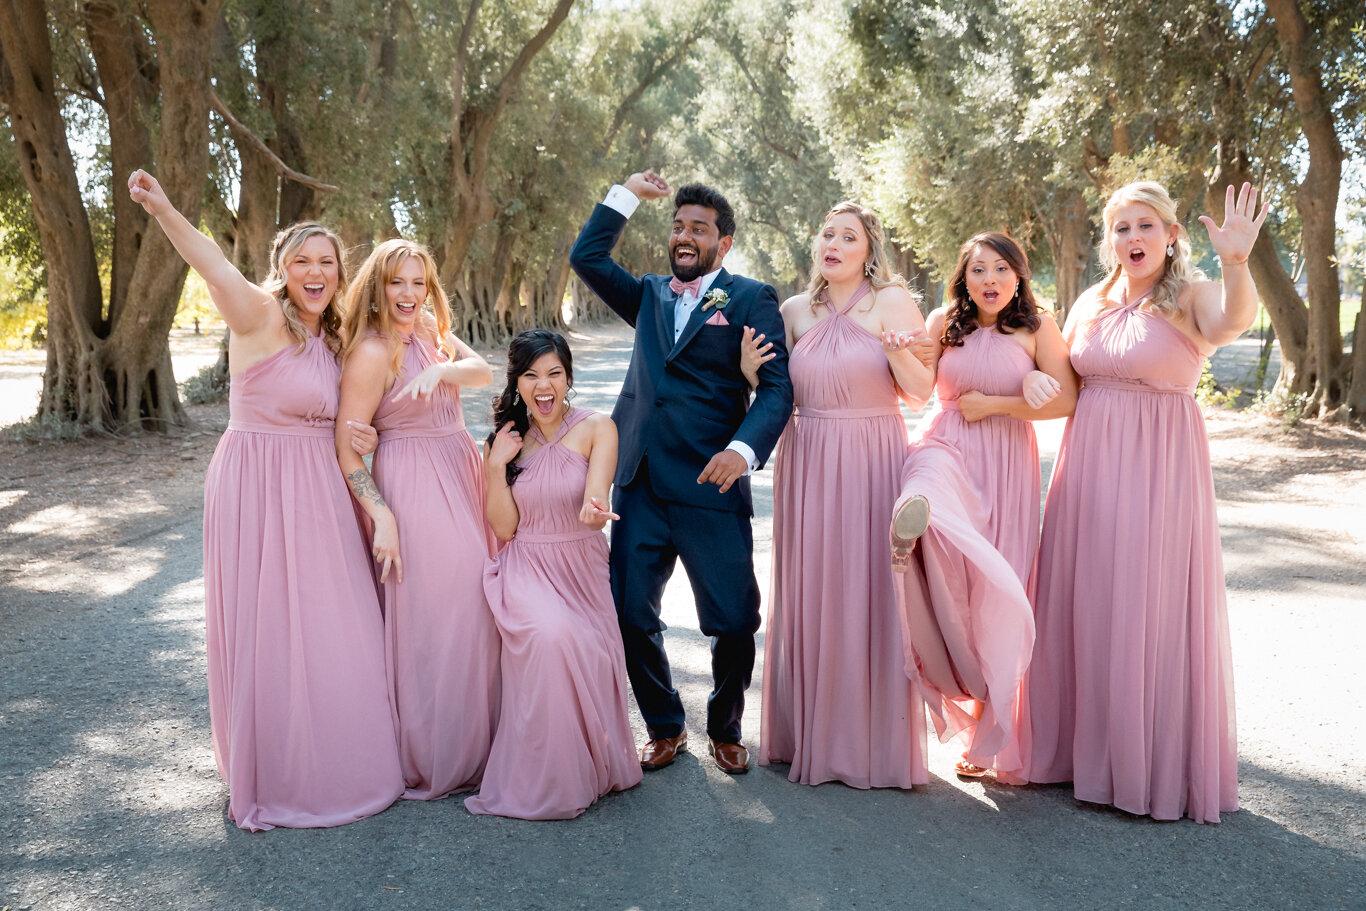 2019.08.24_Emily-Ashir-Wedding-at-the-Maples-5430.jpg